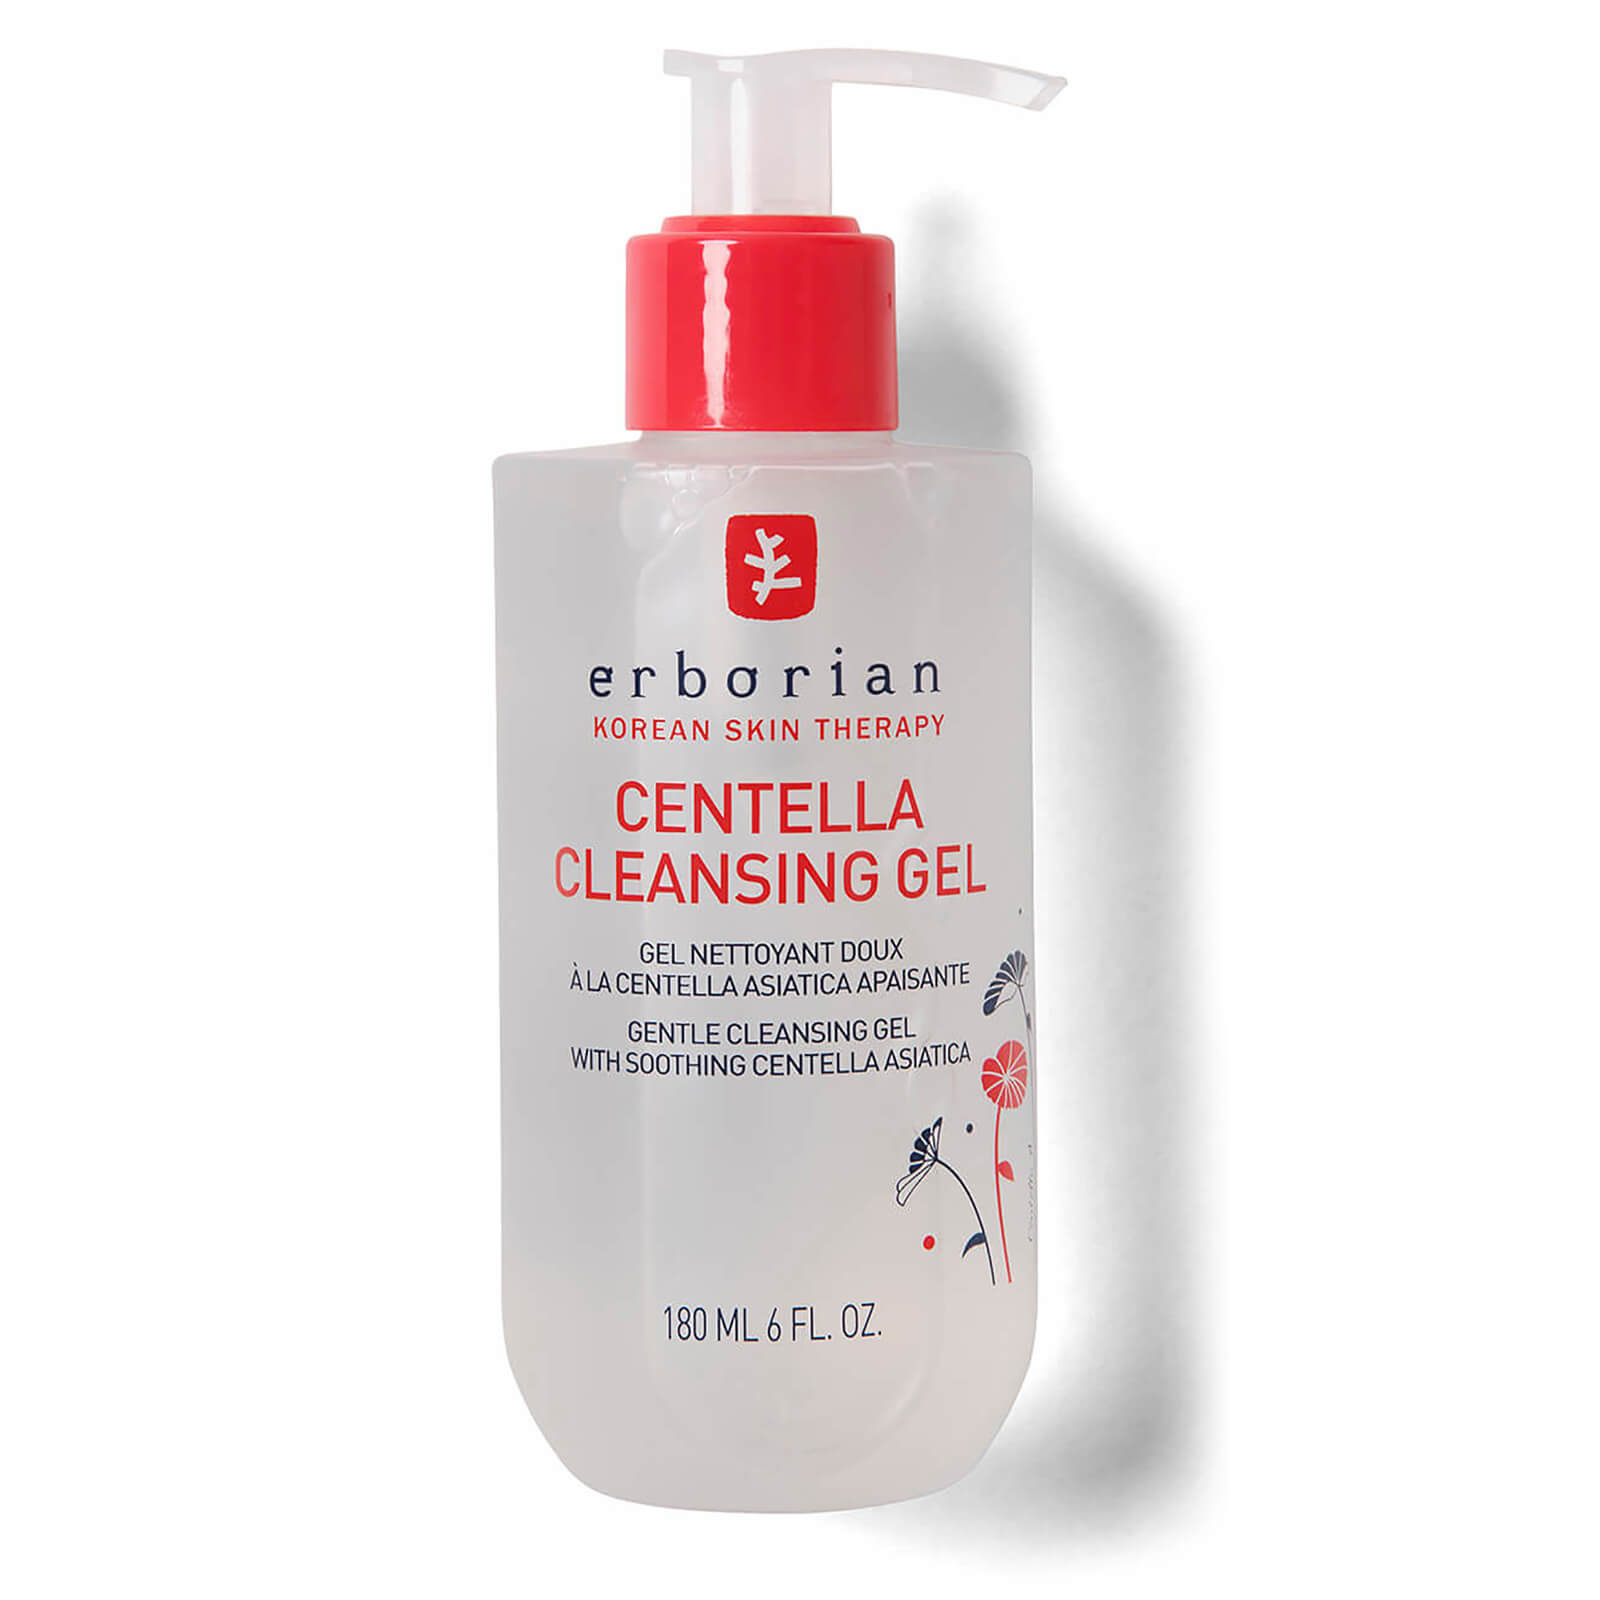 Erborian Centella Cleansing Gel - 180ml